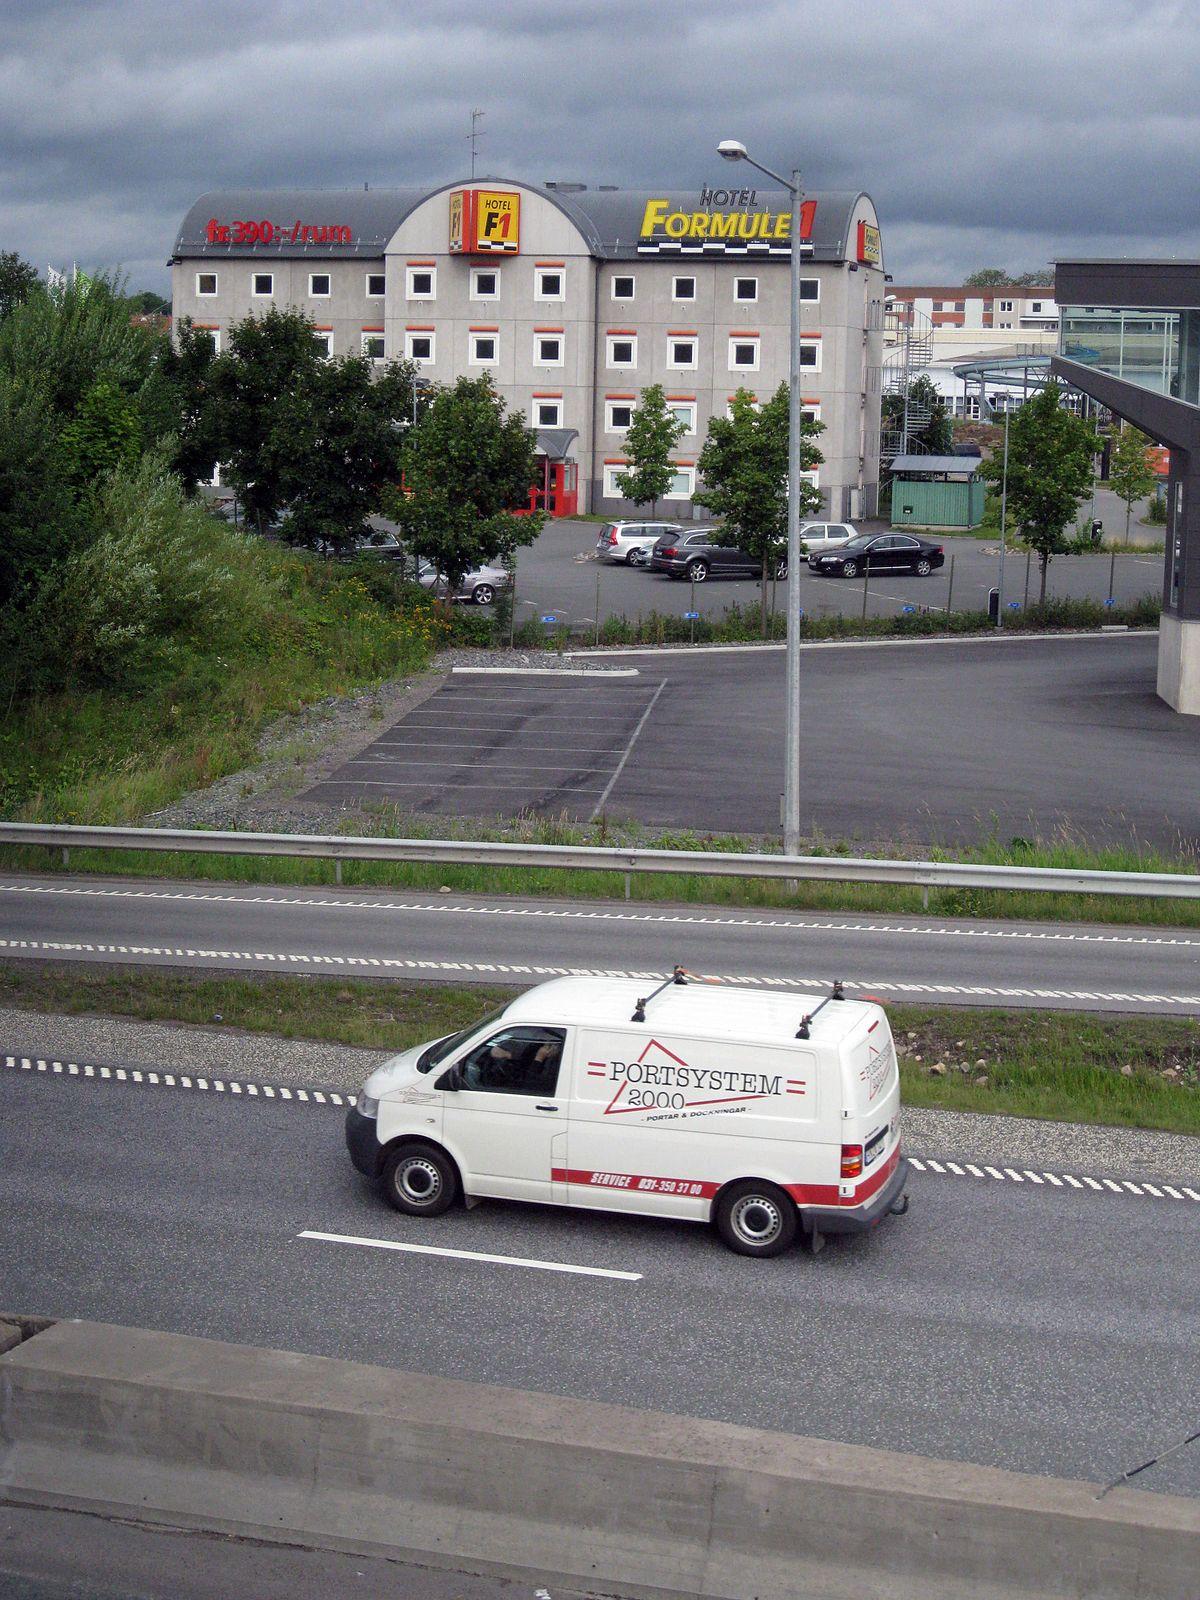 Formule1 hotel Jönköping.jpg